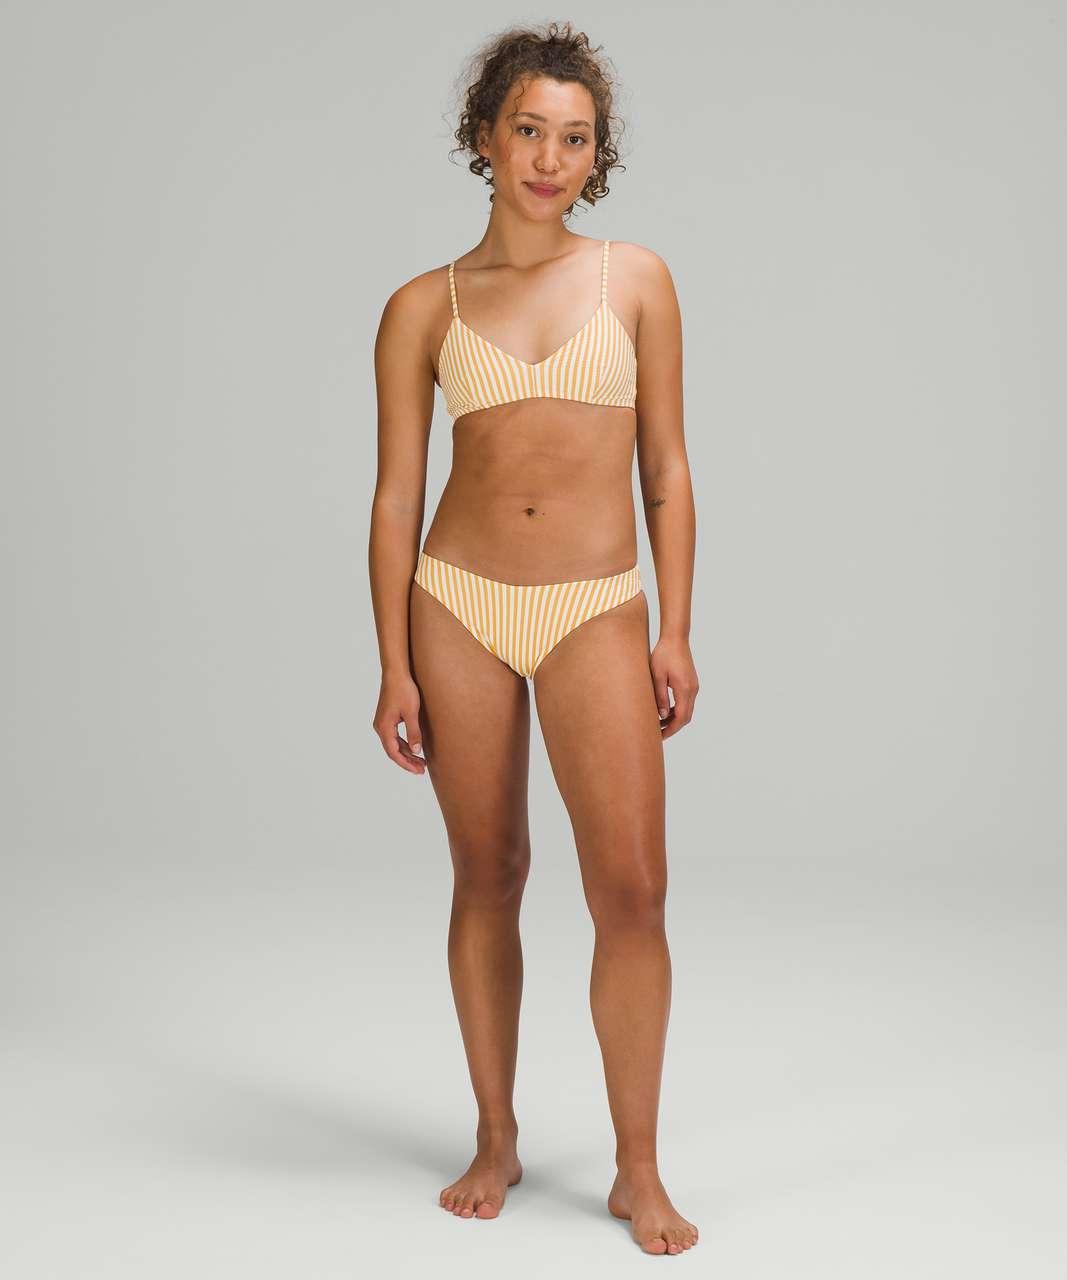 Lululemon Seersucker Triangle Swim Top *A/B Cups - Energize Stripe White Wheat Yellow